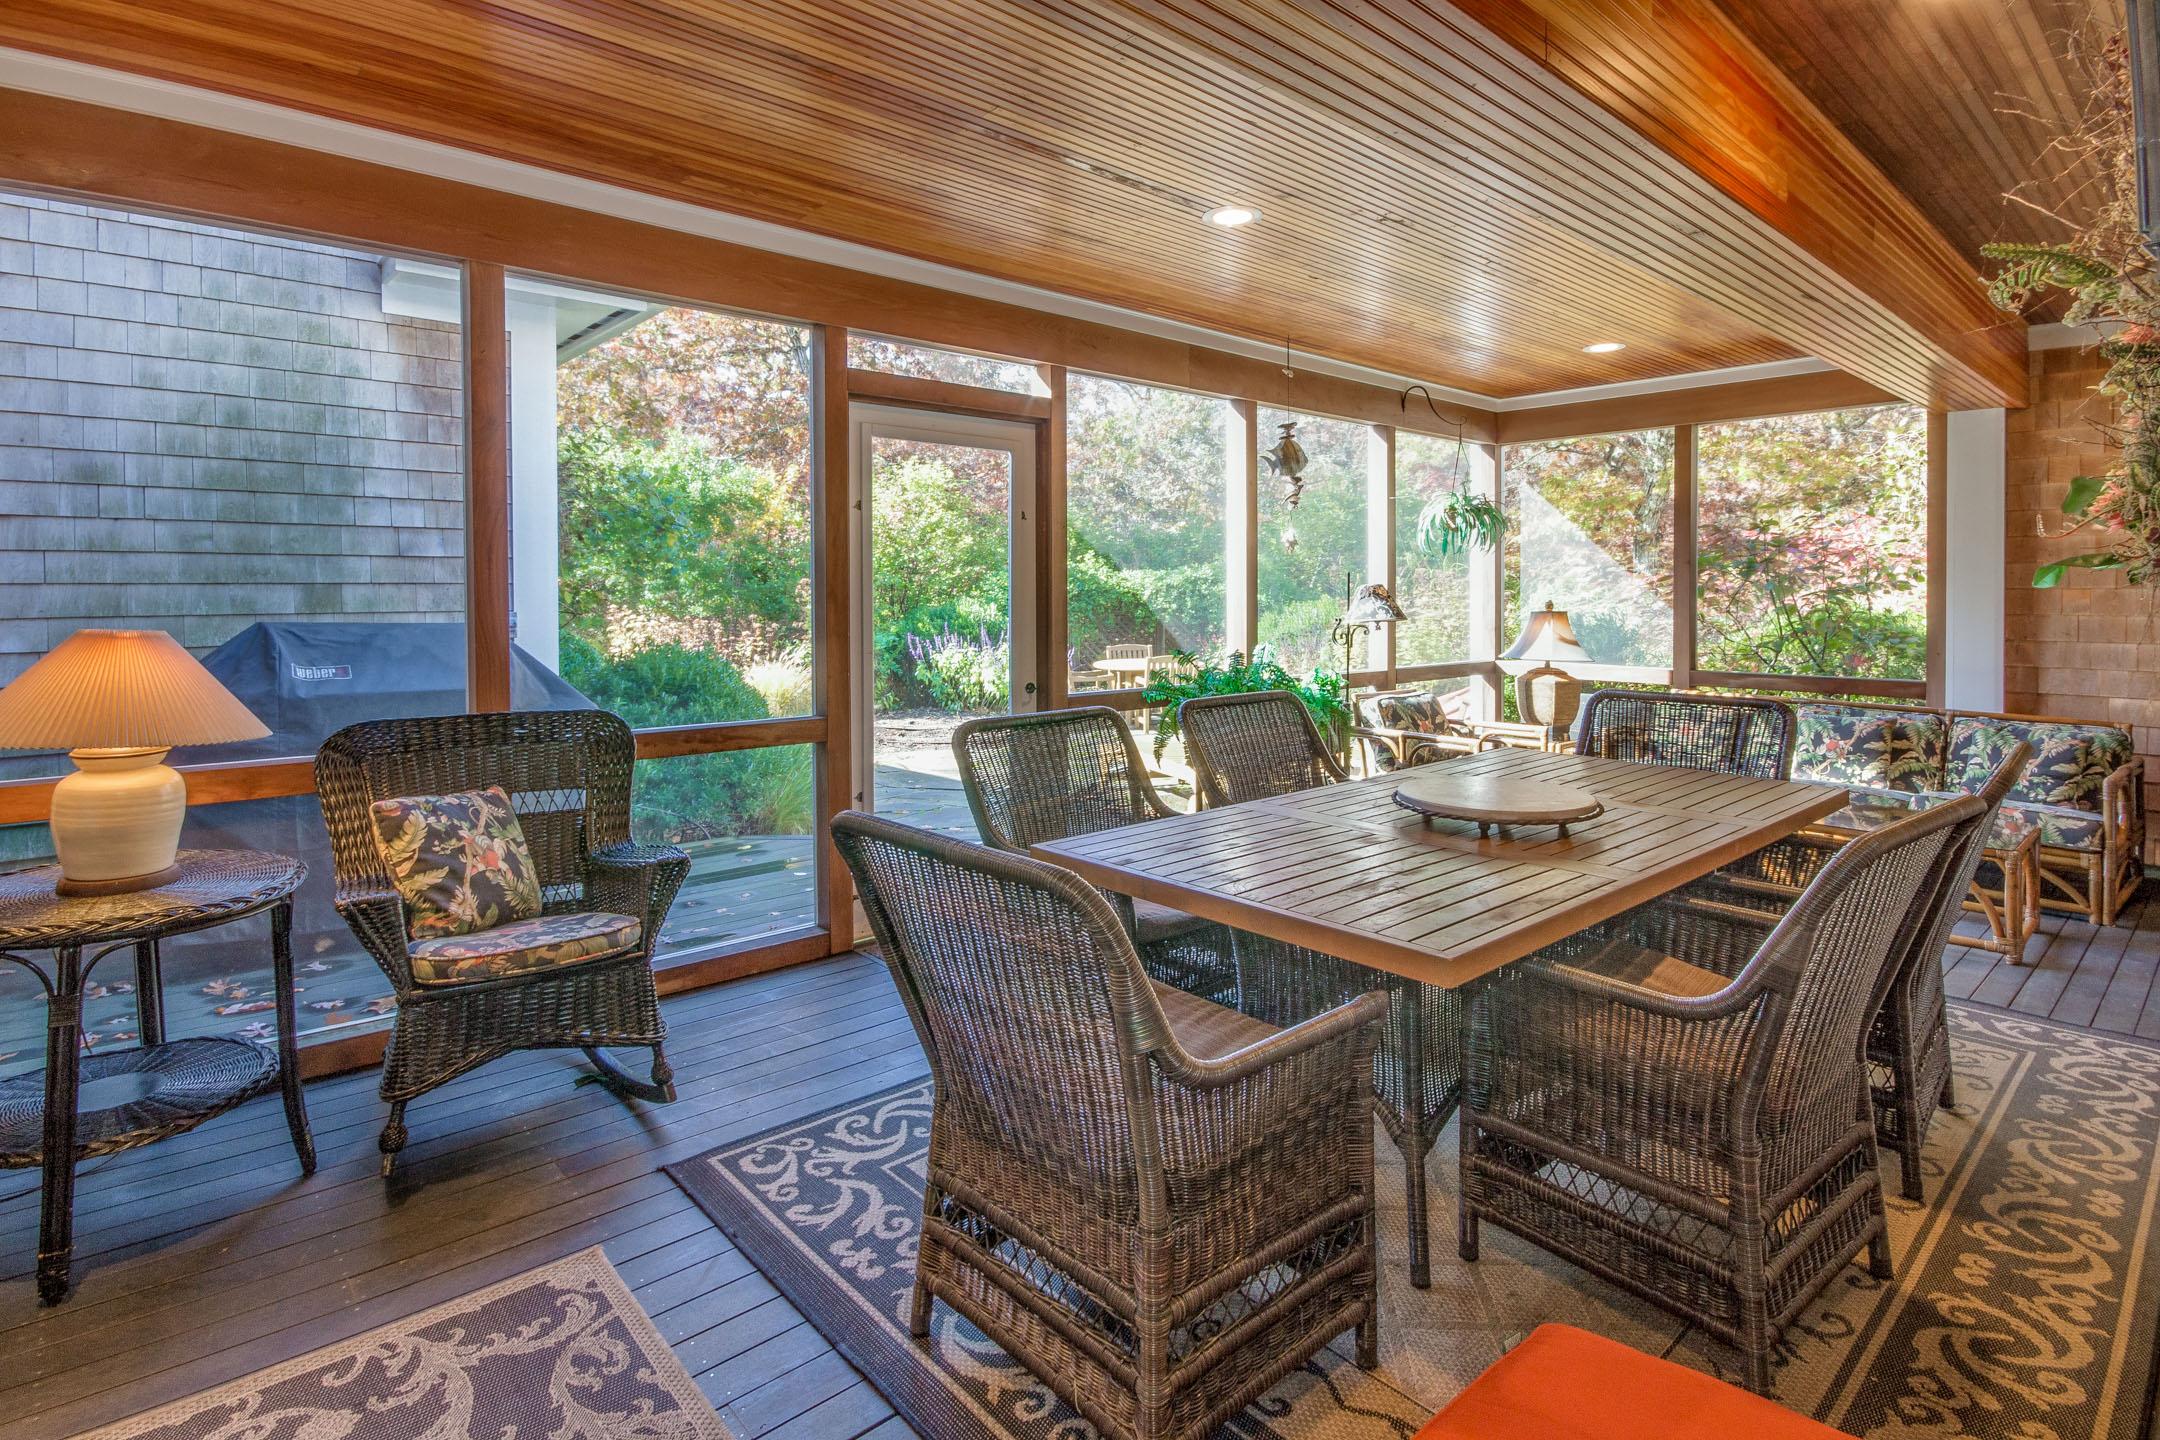 Buy a Home in Chilmark Martha's Vineyard